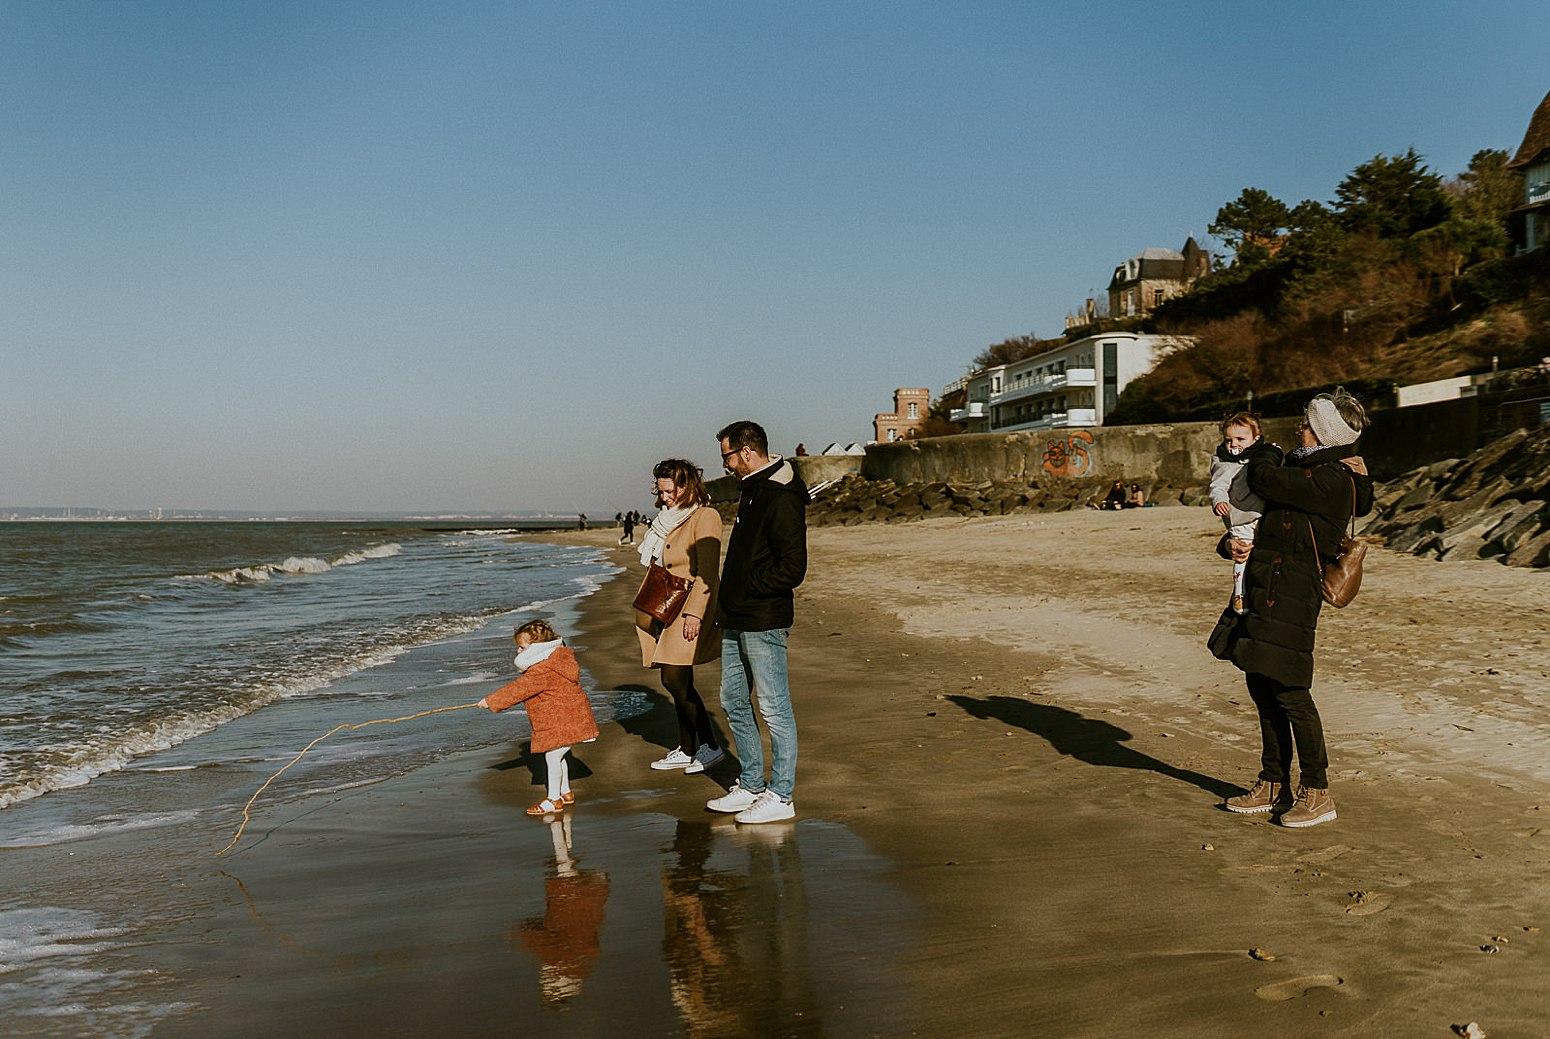 photographe-famille-normandie-plage_0028.jpg